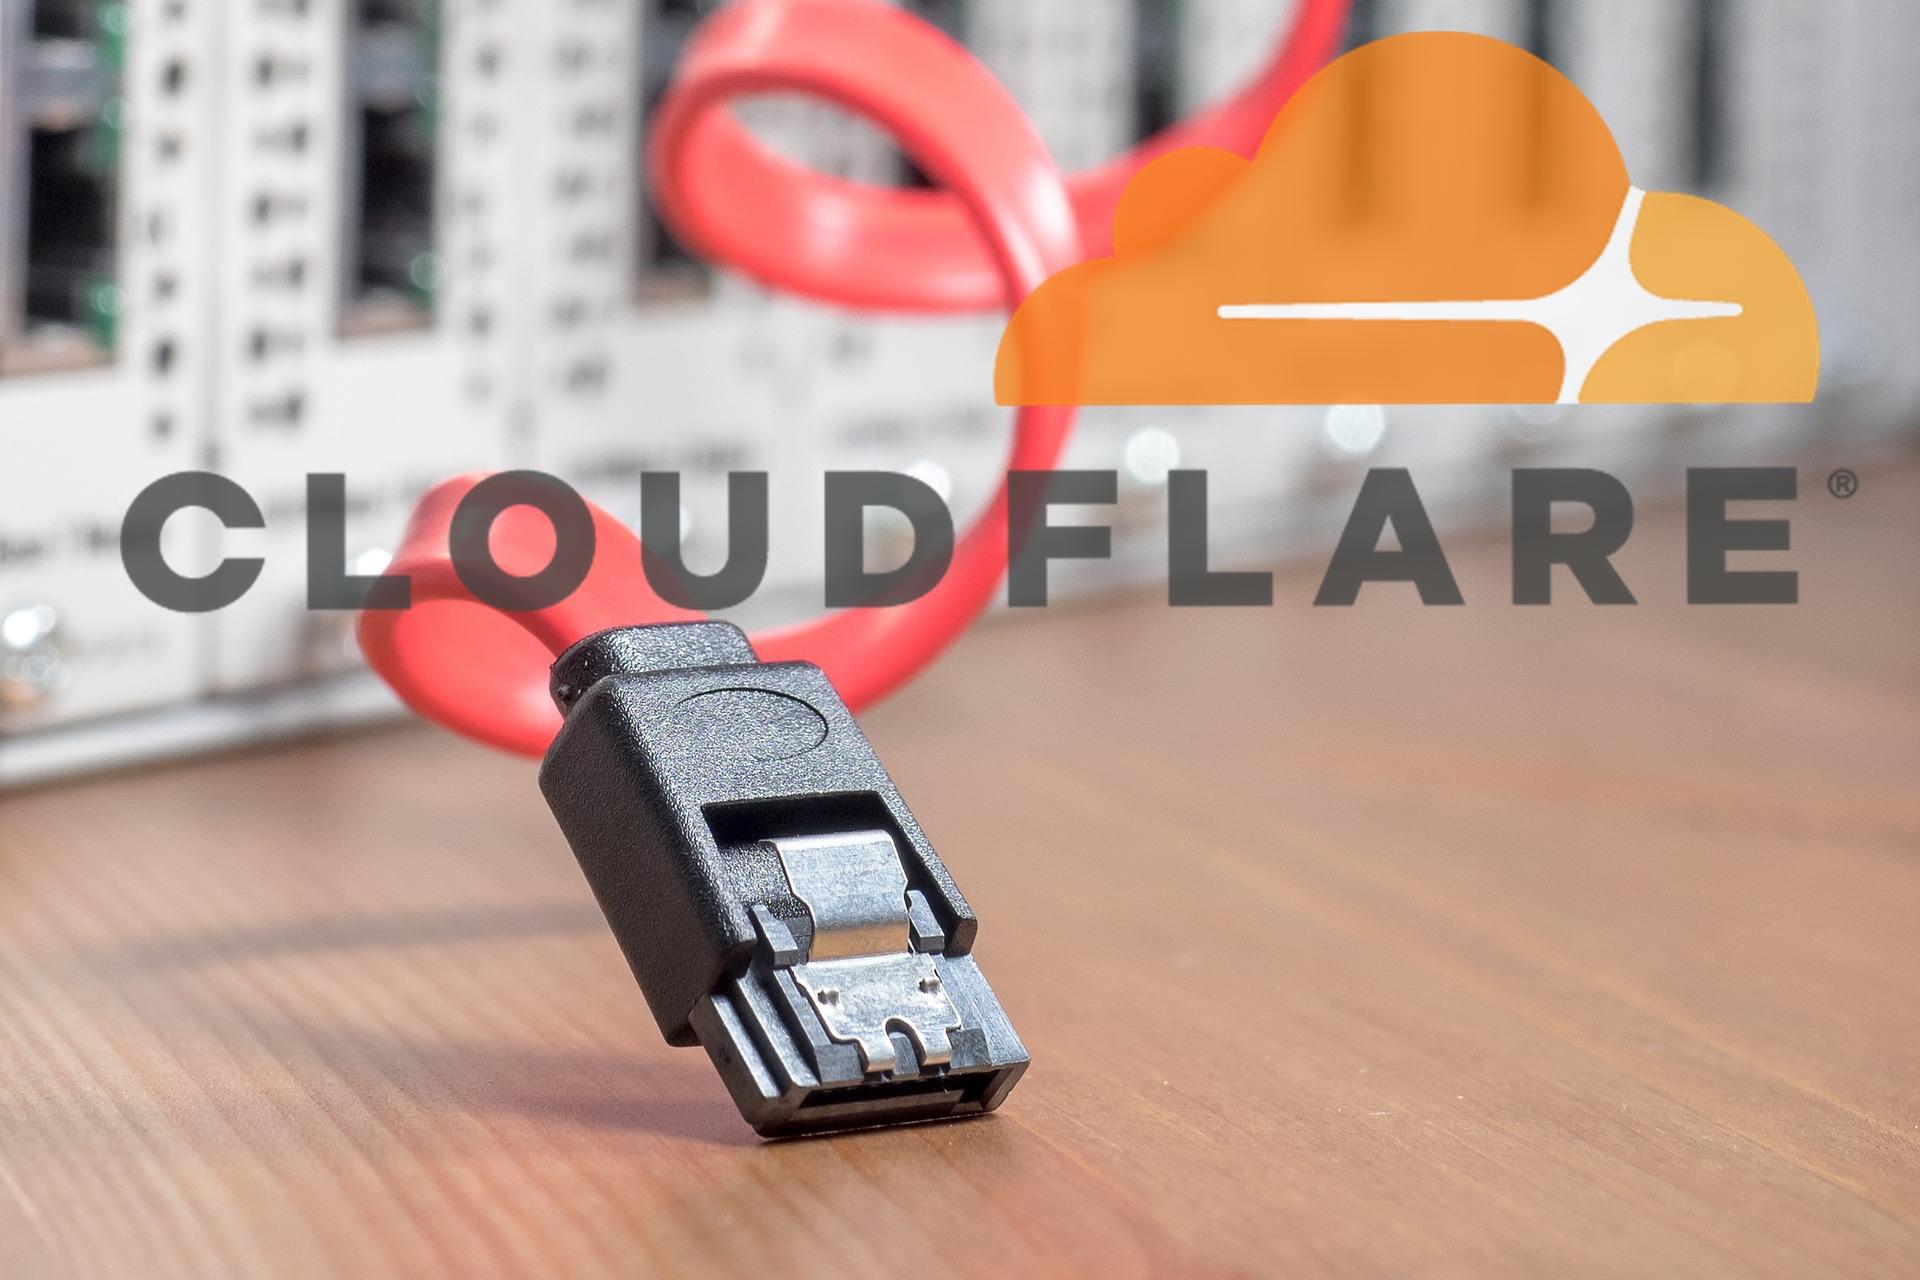 Cloudflare servers